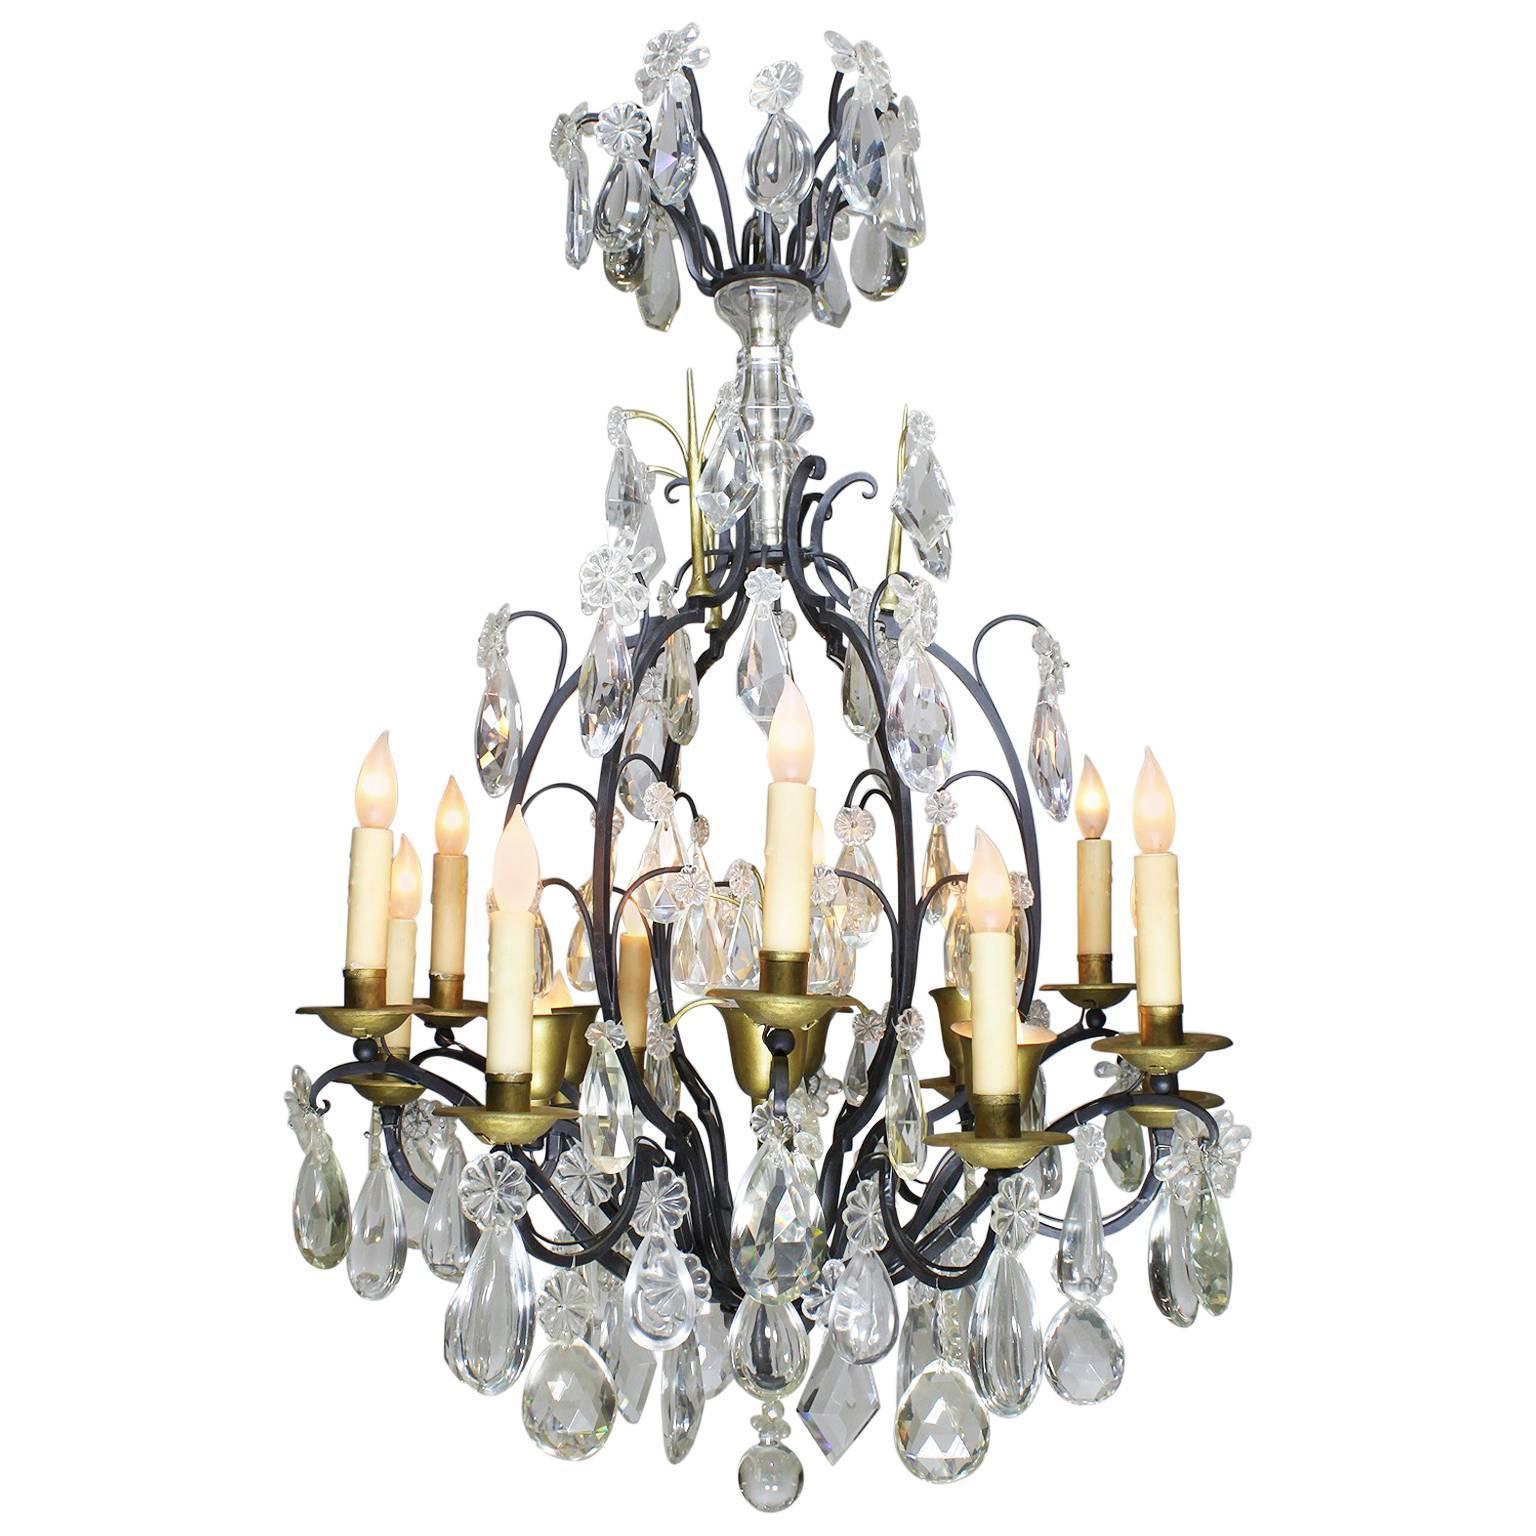 19th-20th Century Louis XV Style Wrought Iron Eighteen-Light Crystal Chandelier